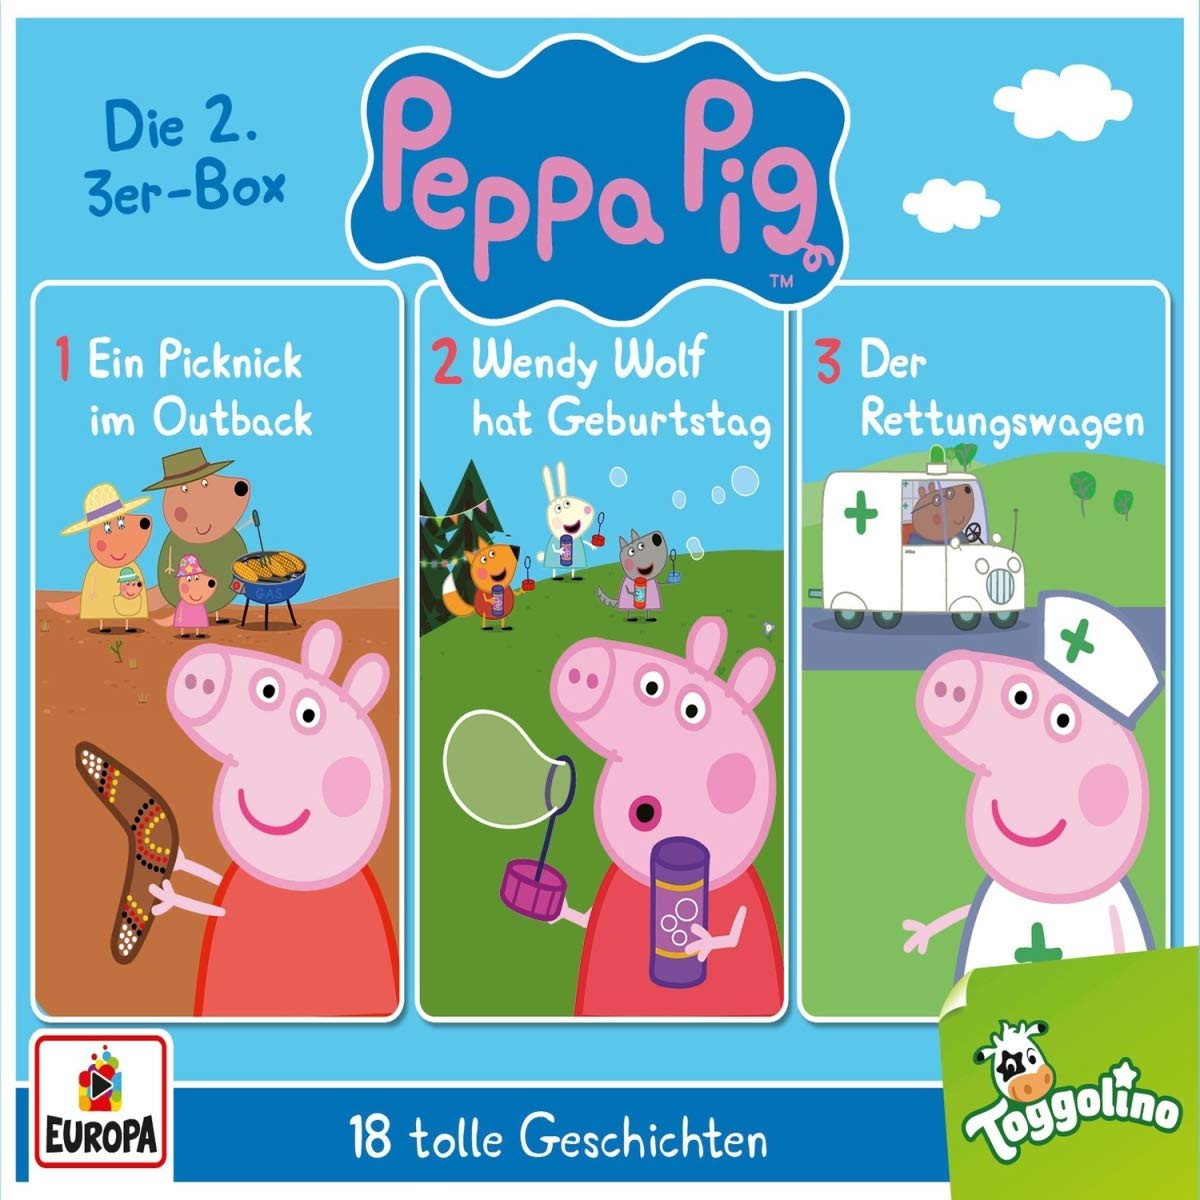 Peppa Pig (Peppa Wutz) - Die 2. 3er-Box (Folgen 4, 5, 6)